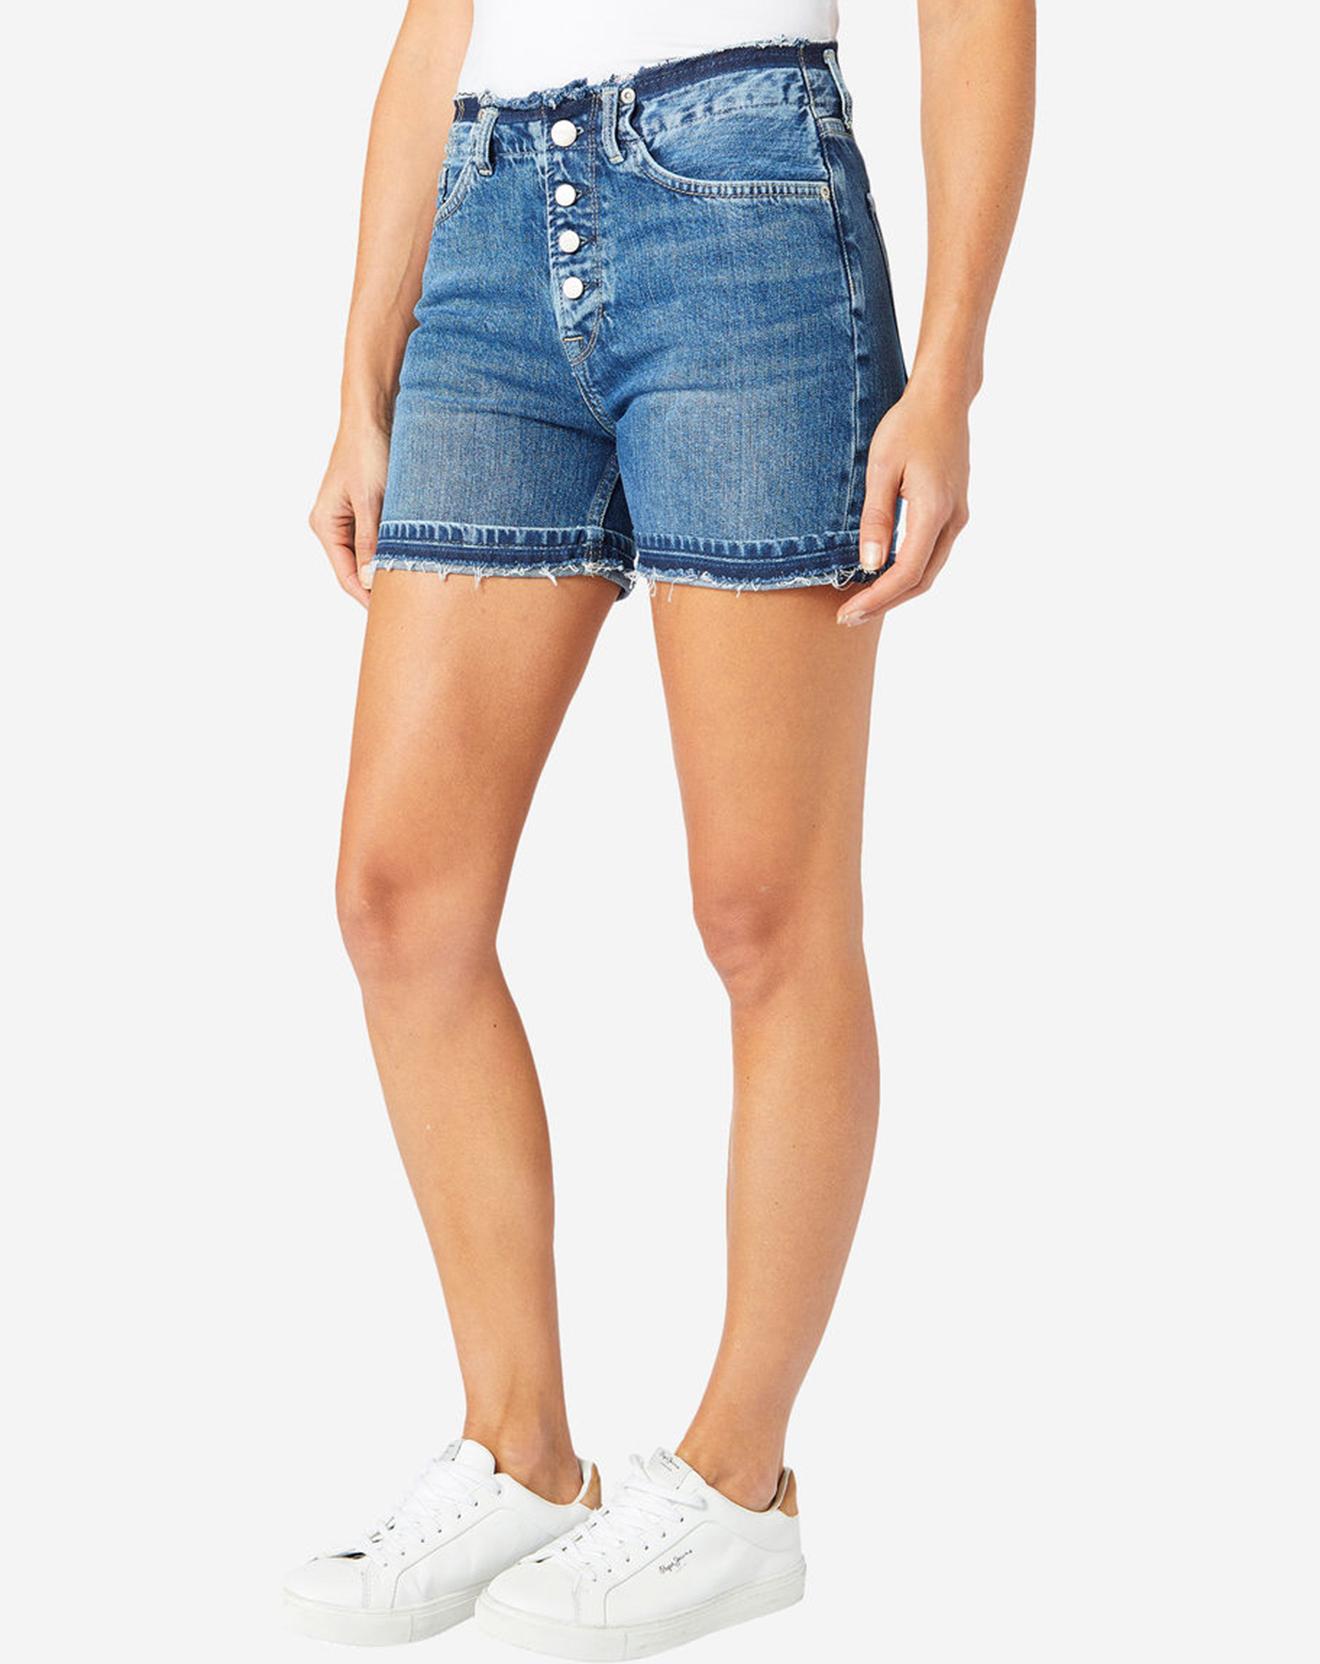 Short en jean Frange Mode bleu - Pepe Jeans - Modalova